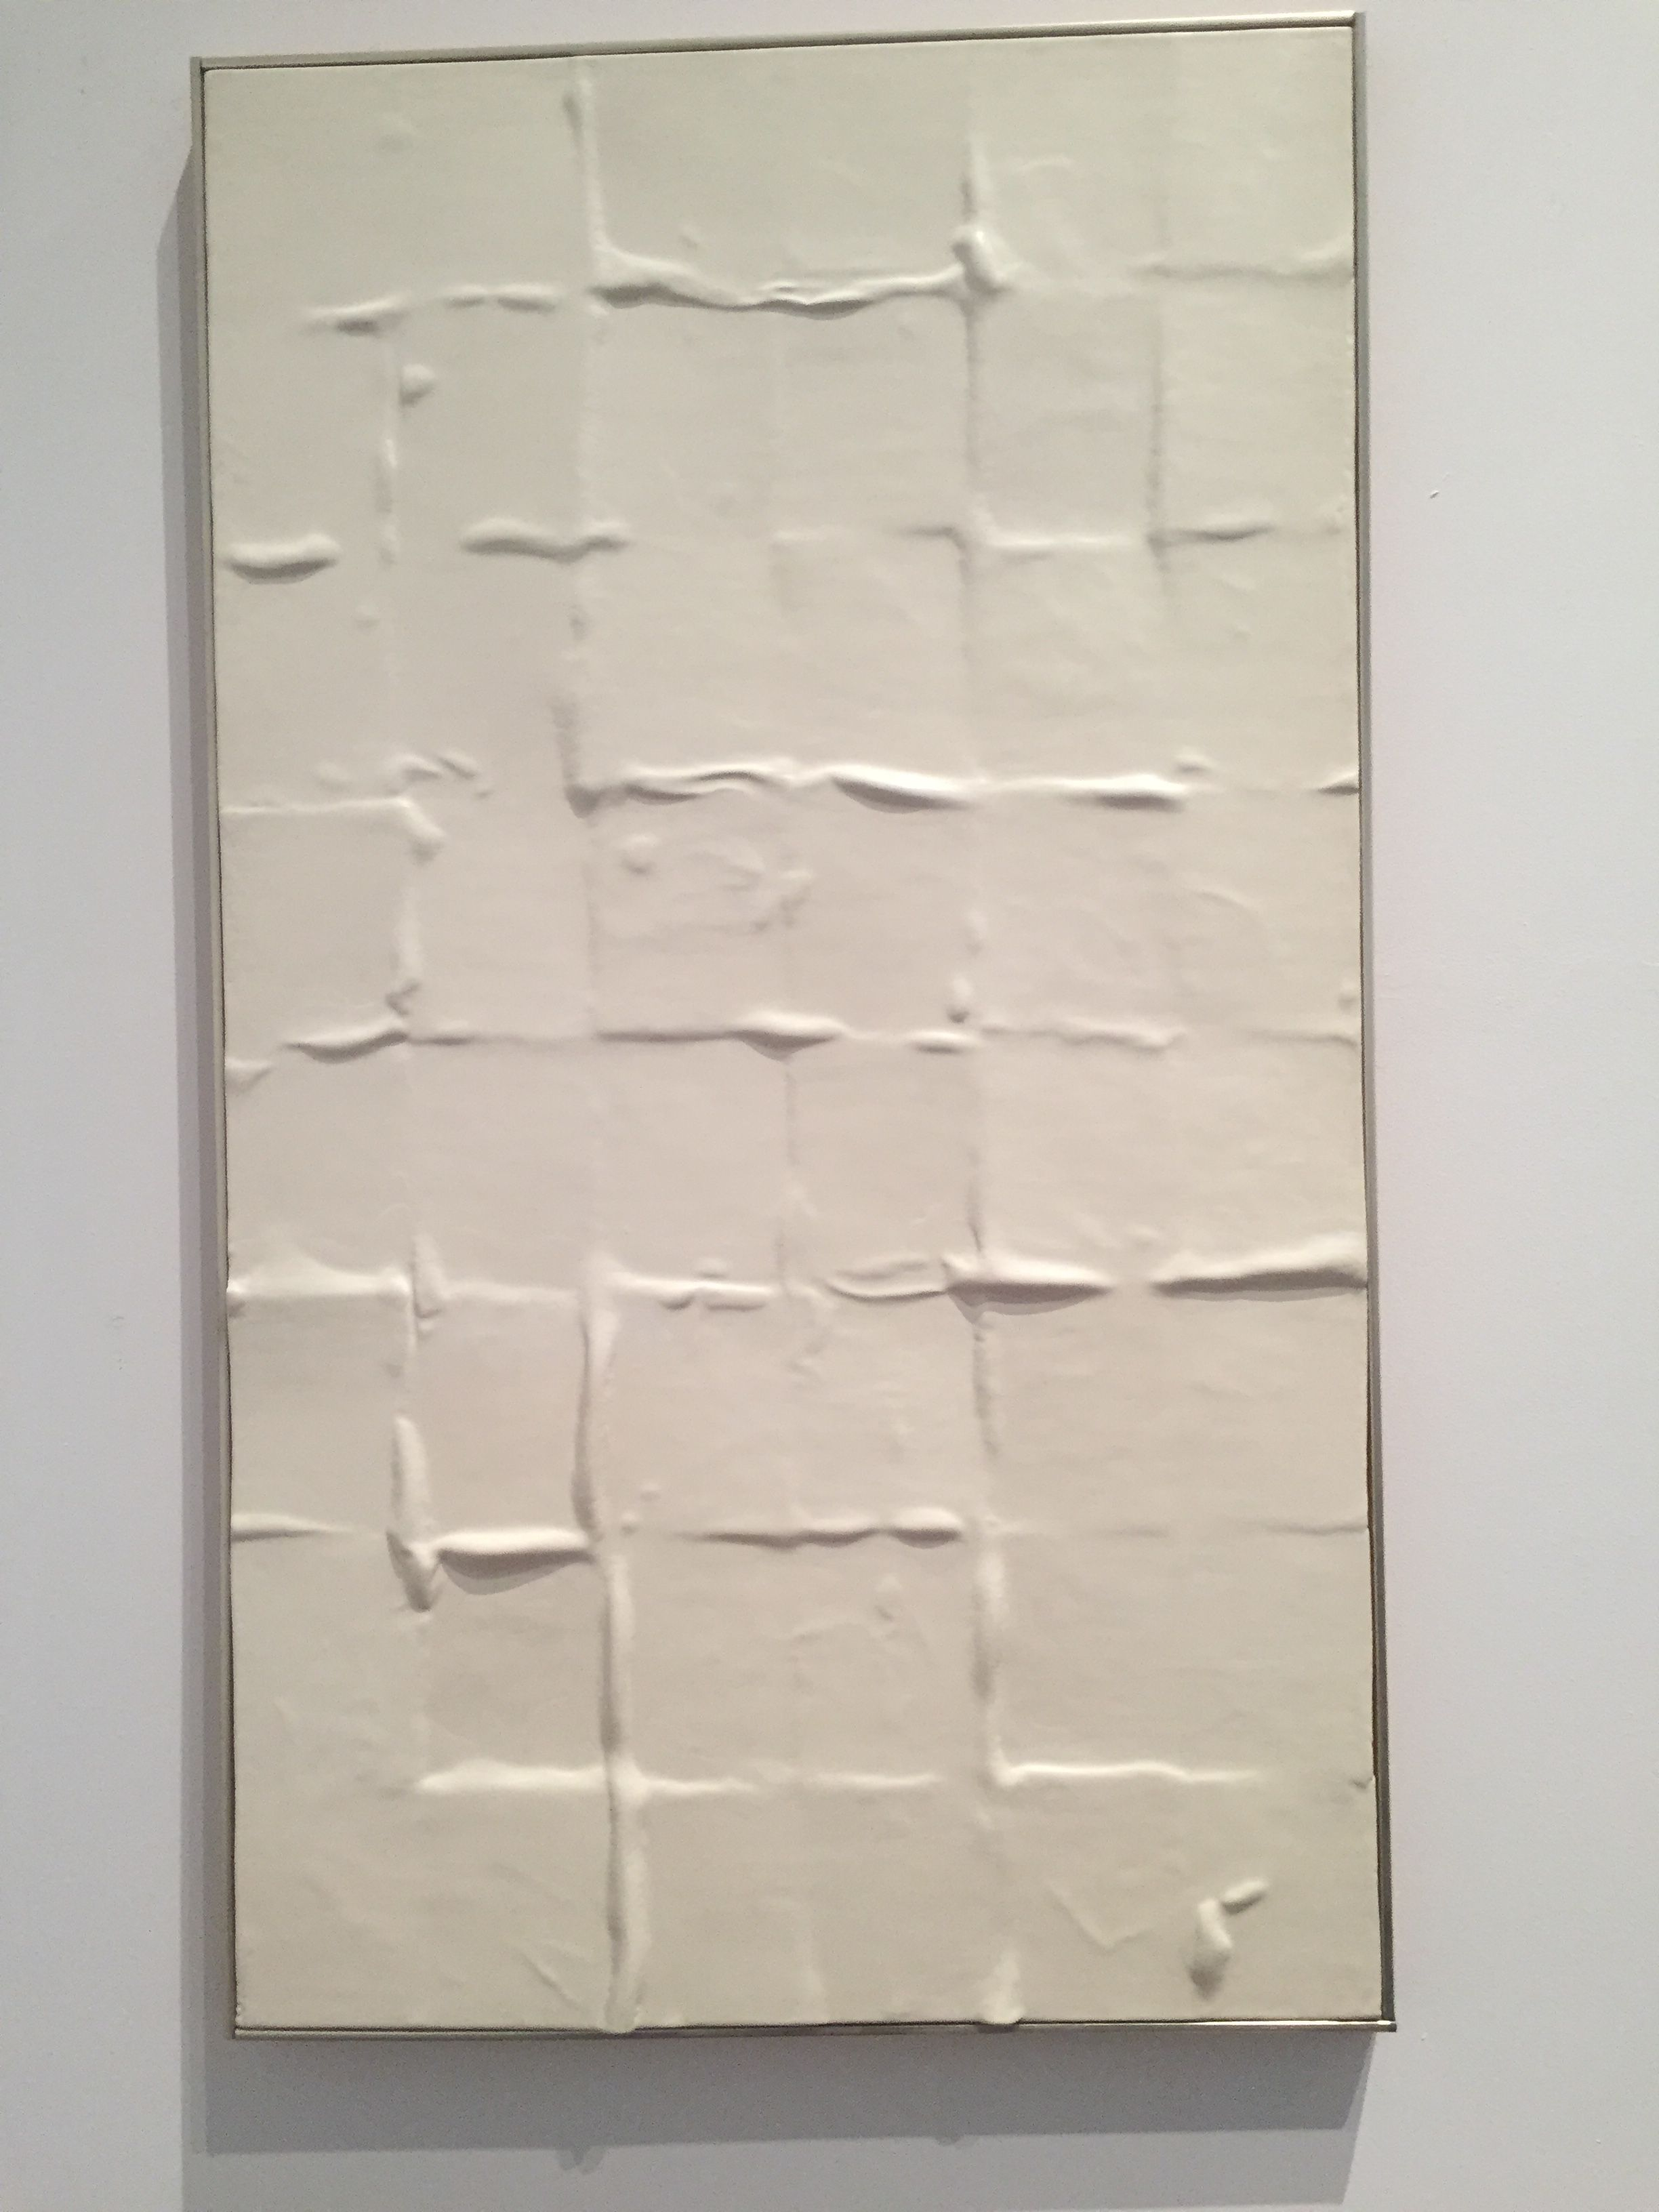 Eleanore Mikus Tablet 164 1967-68 epoxy resin on fiberglass